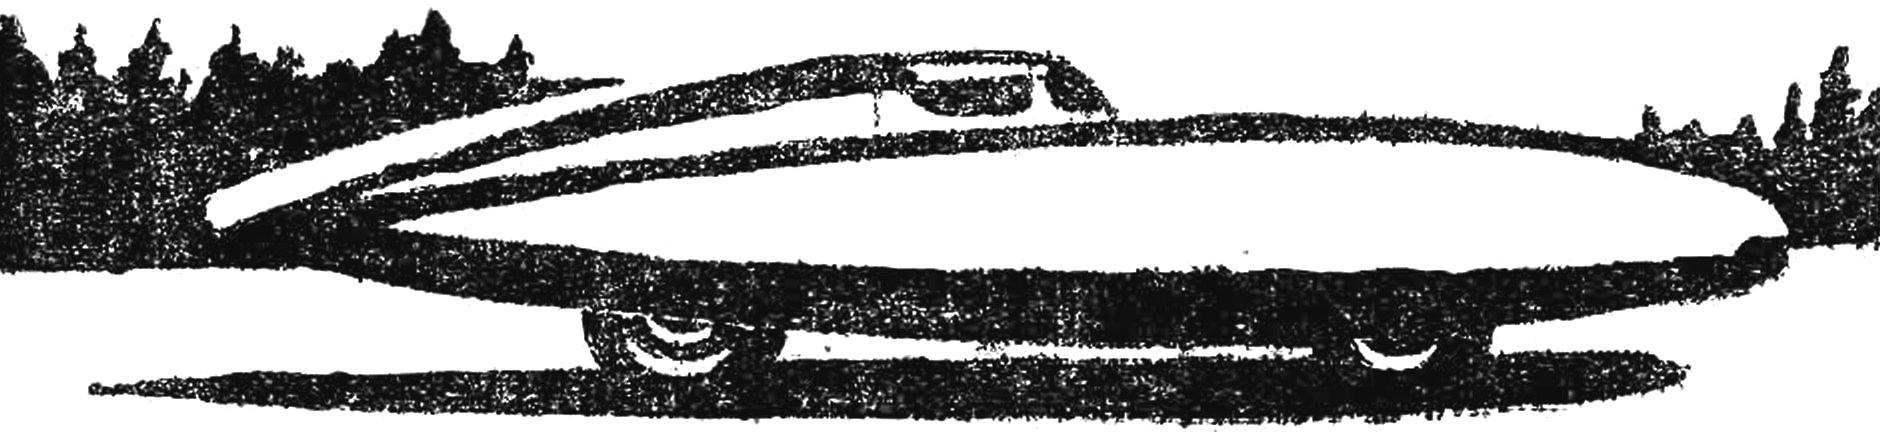 Racing car GAZ 1951, built on the basis of units of